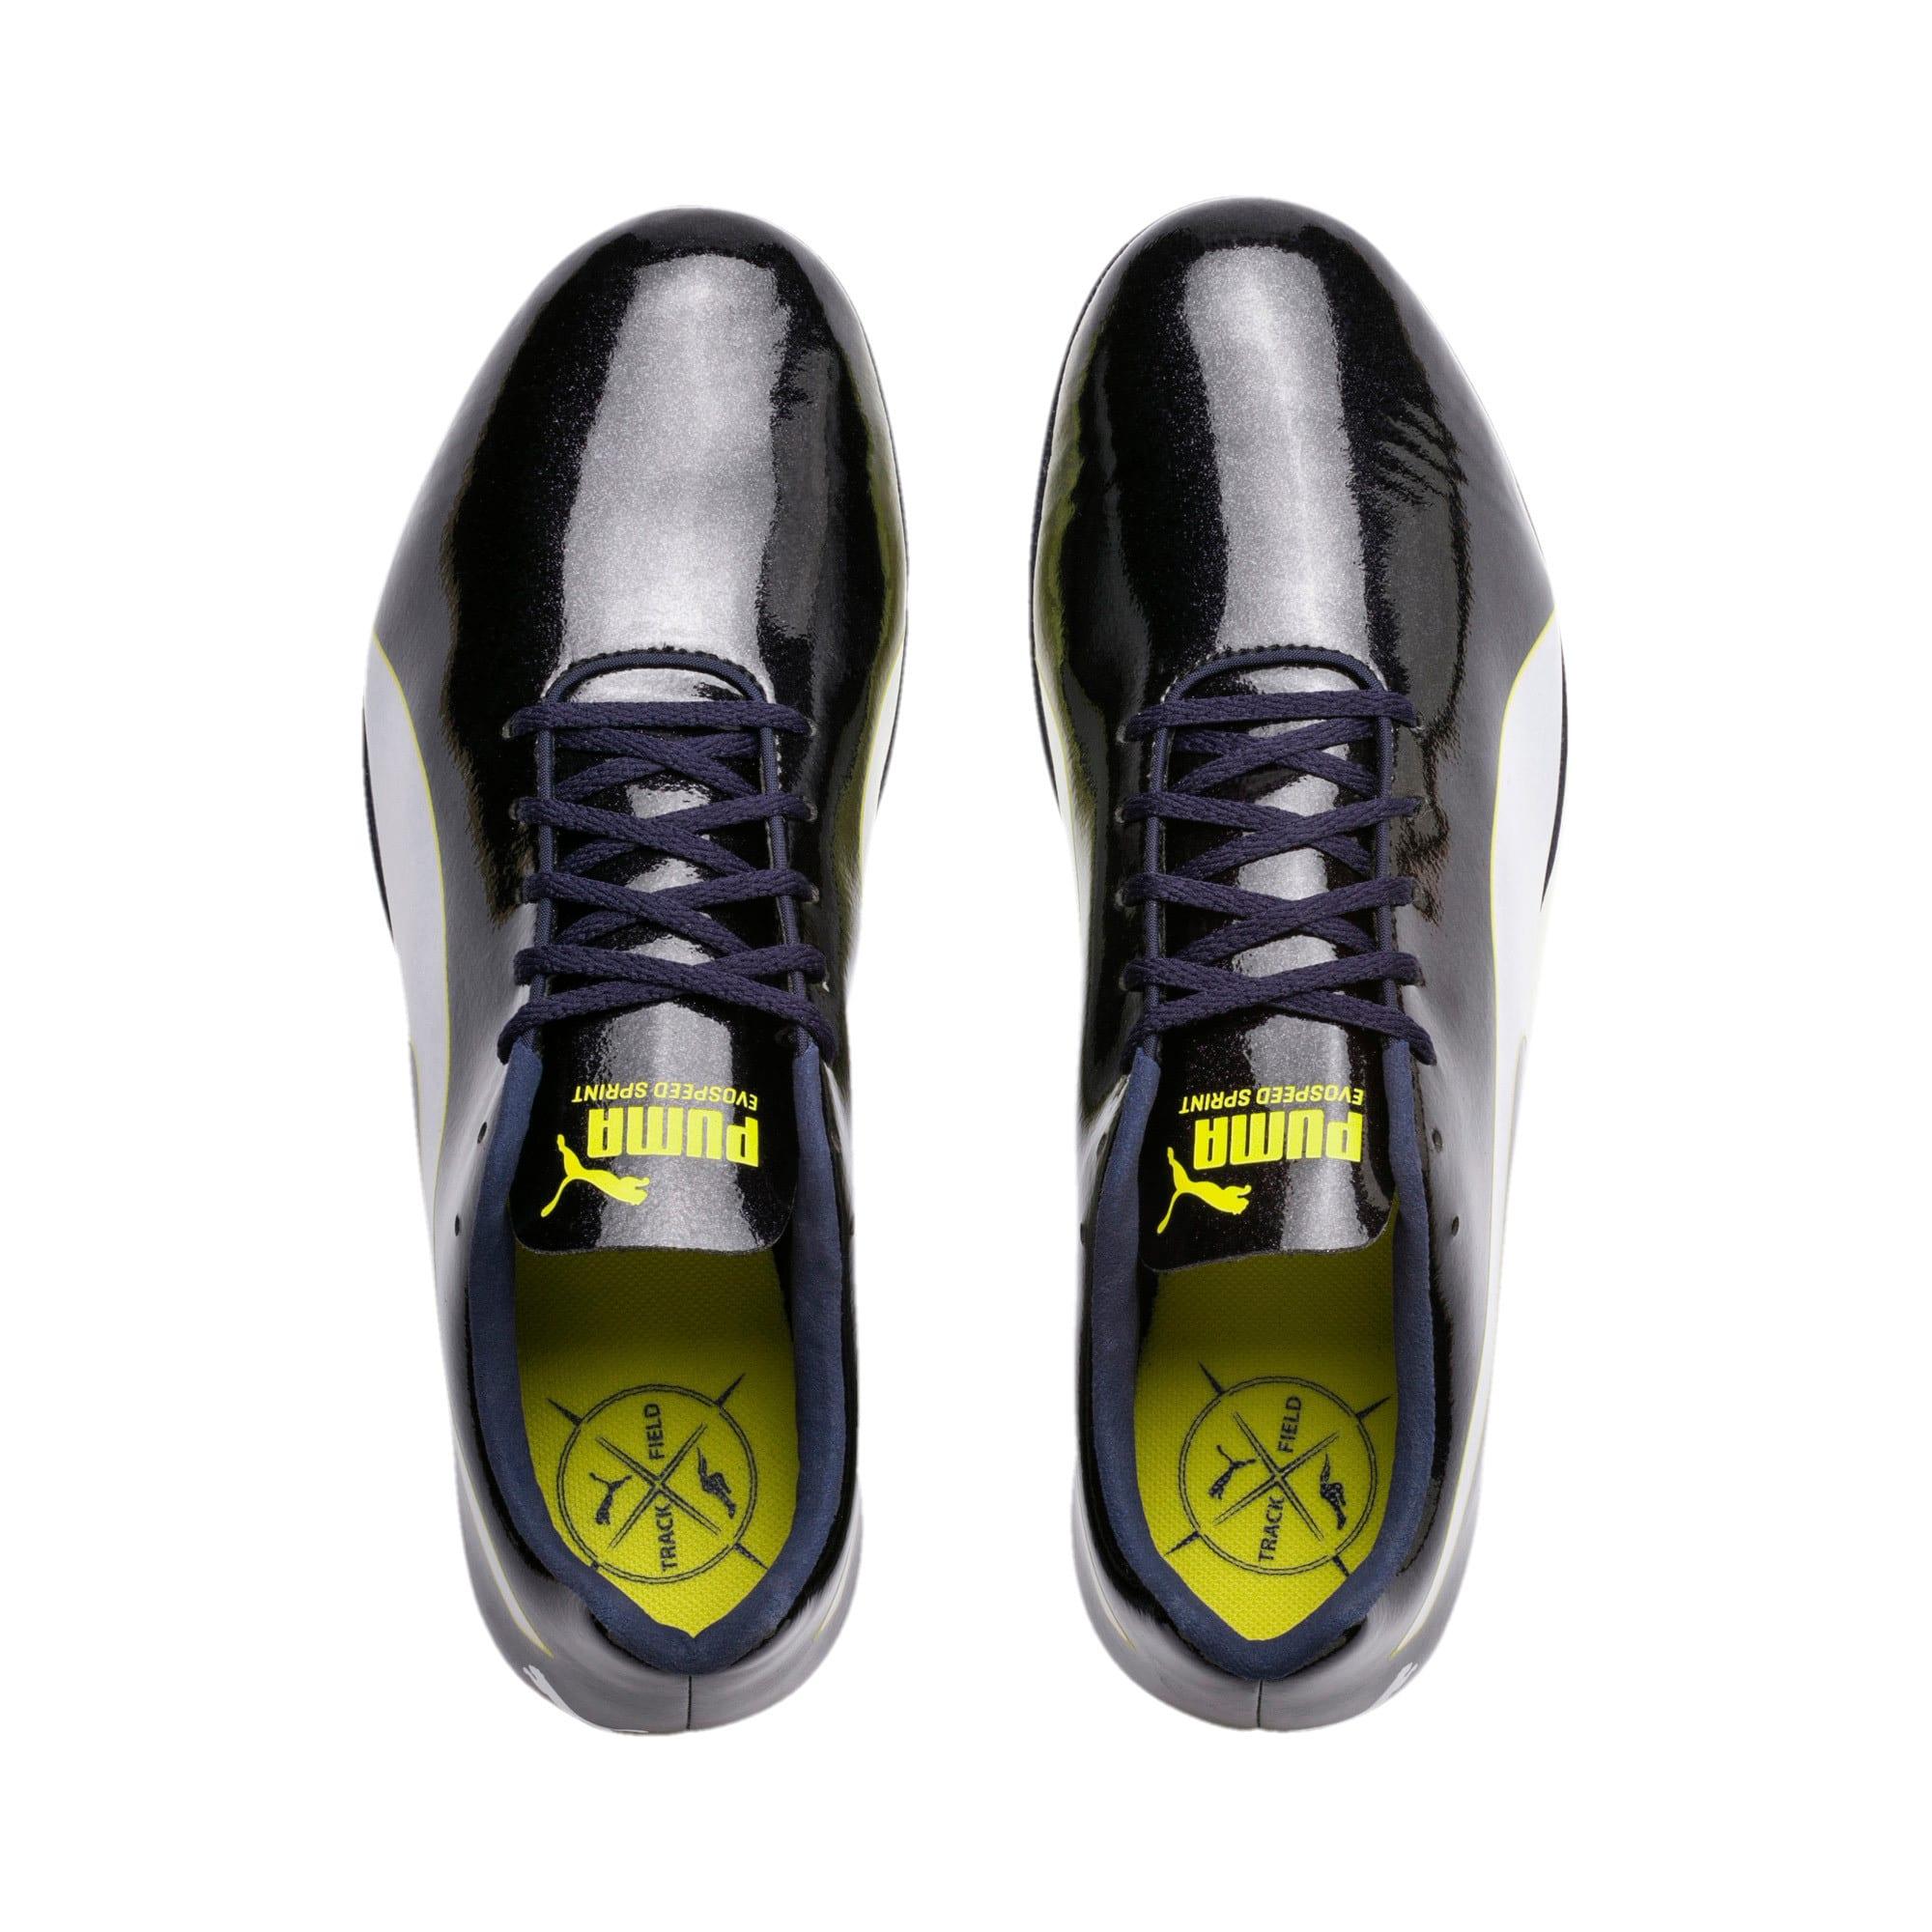 Thumbnail 6 of evoSPEED Sprint 9 Running Shoes, Black-Blazing Yellow-White, medium-IND